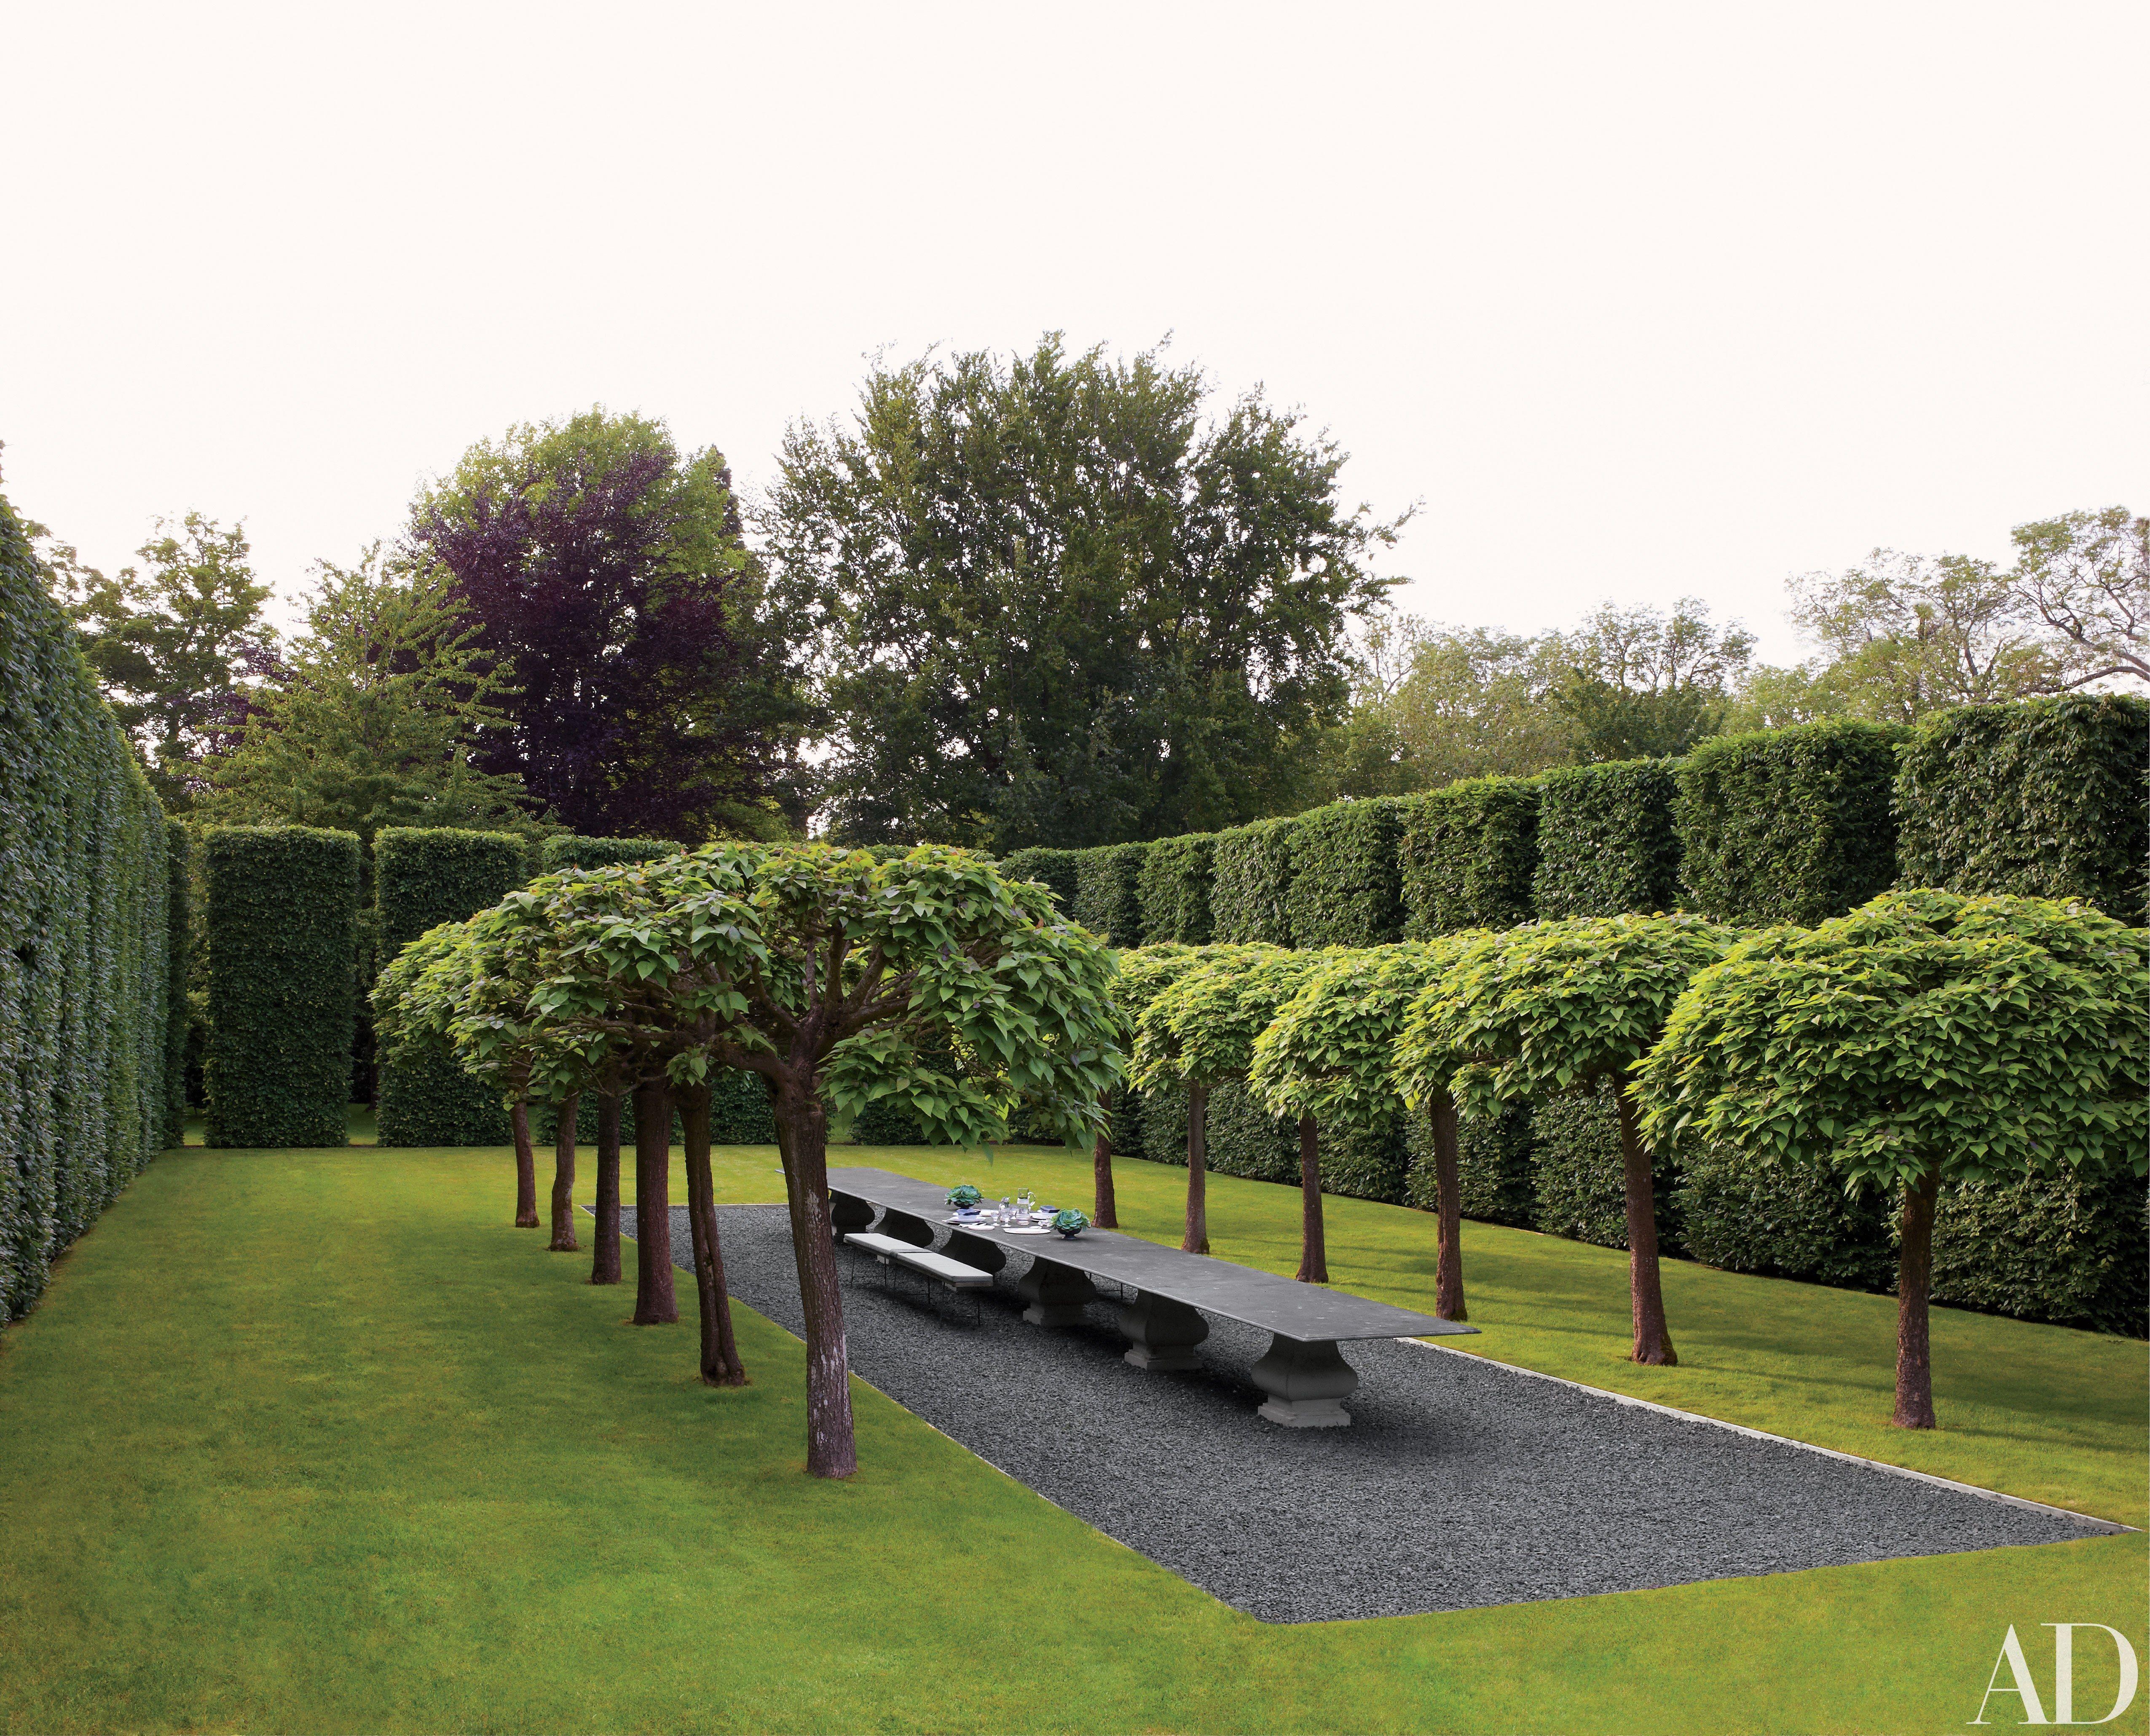 38 Beautifully Landscaped Home Gardens Architectural Digest Landscape Design Formal Gardens Garden Design